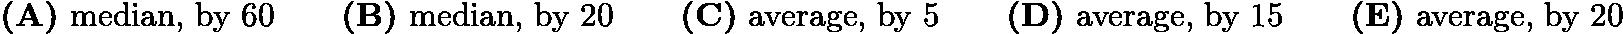 $\textbf{(A)}\ \text{median, by 60} \qquad \textbf{(B)}\ \text{median, by 20} \qquad \textbf{(C)}\ \text{average, by 5} \qquad \textbf{(D)}\ \text{average, by 15} \qquad \textbf{(E)}\ \text{average, by 20}$